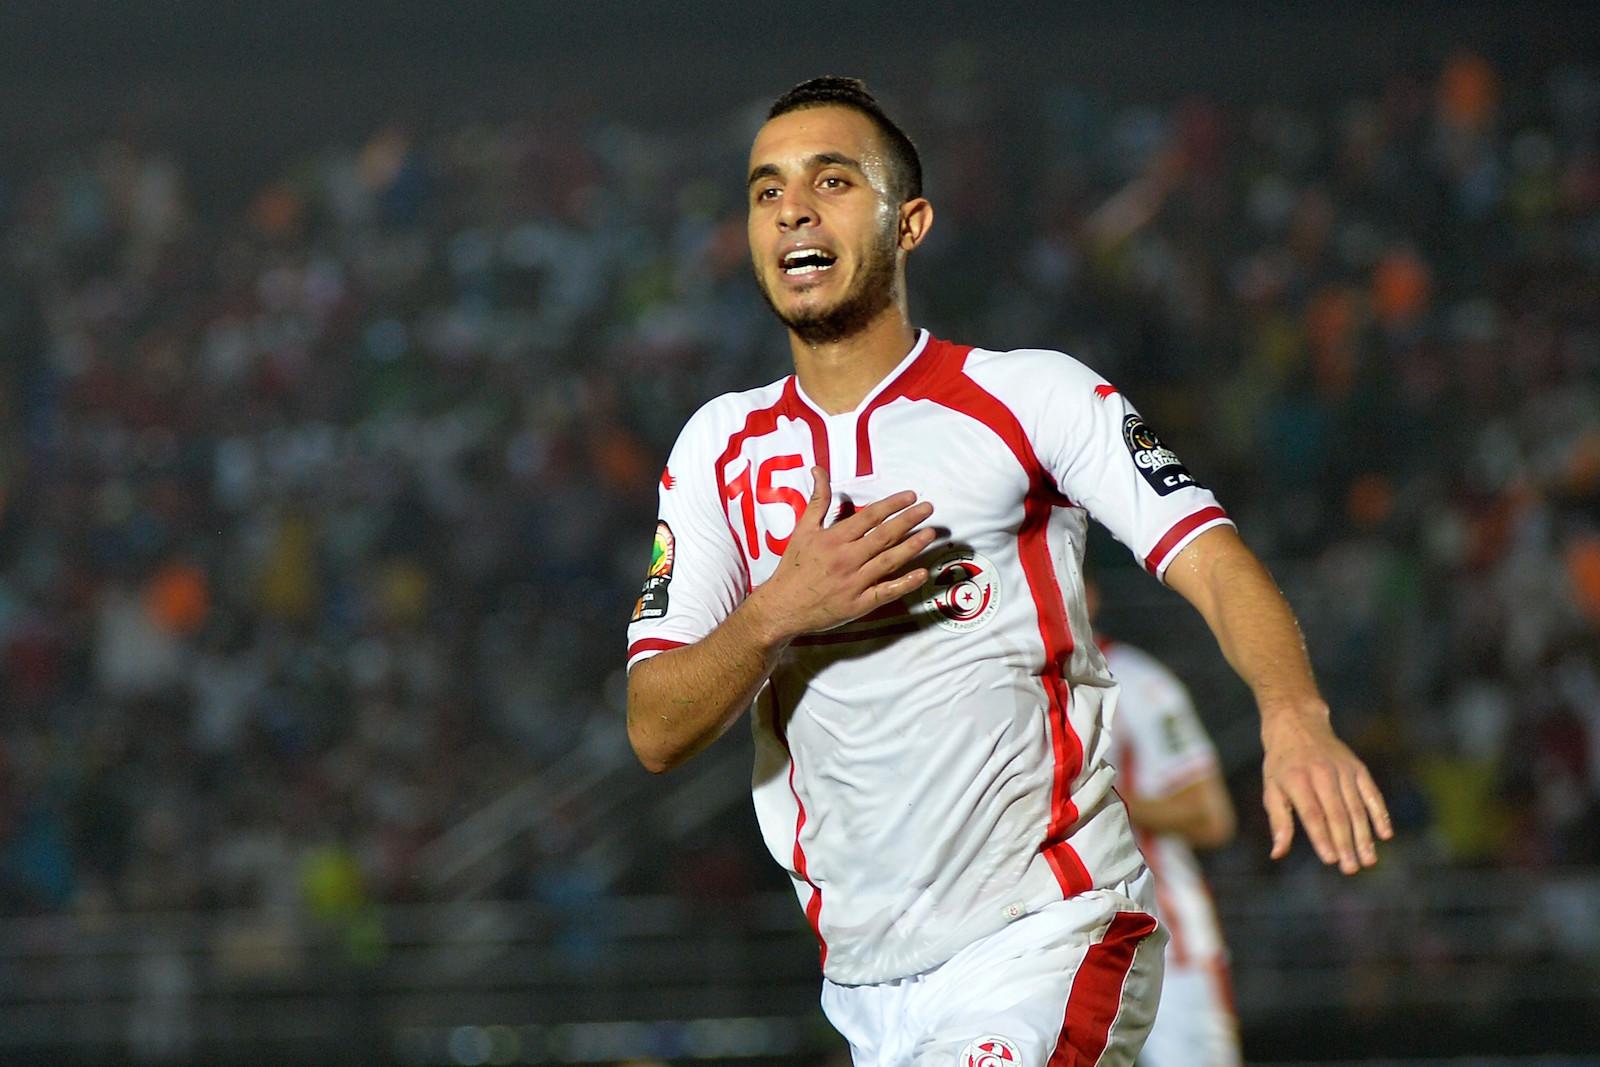 Match Tunisie - Espagne en direct dès 20h45